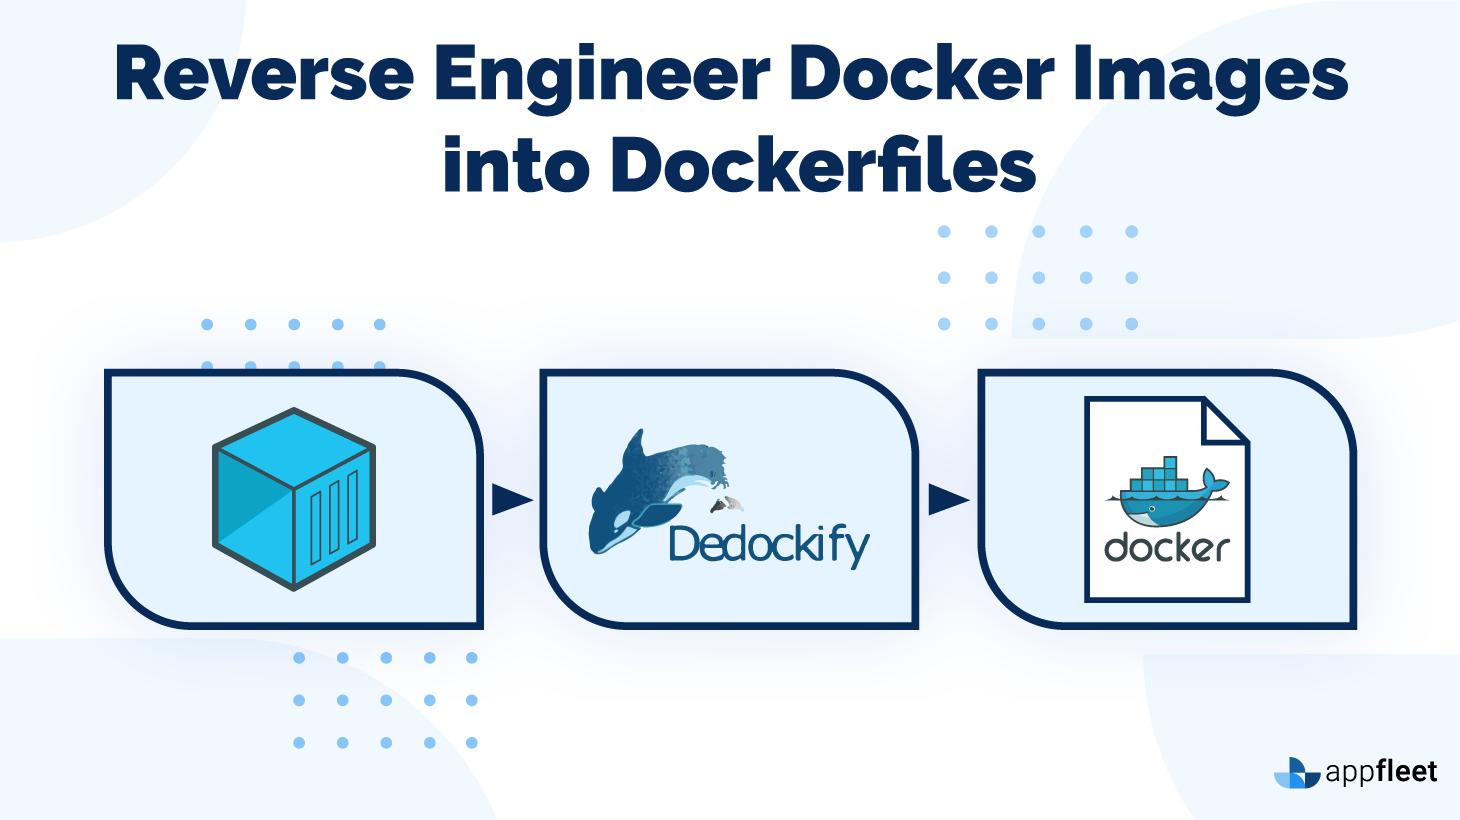 Reverse Engineer Docker Images into Dockerfiles